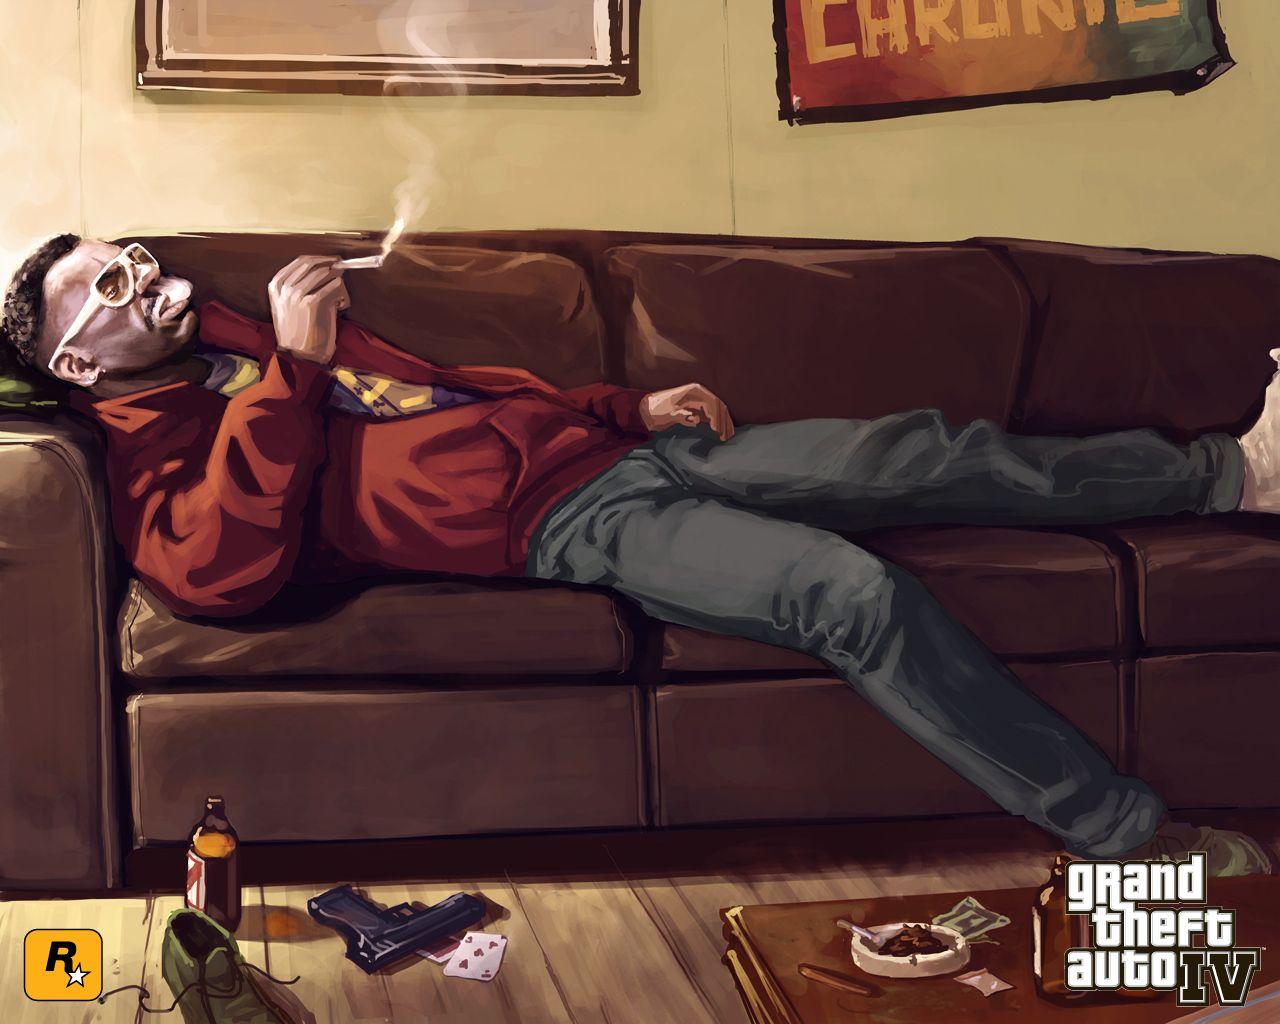 Grand Theft Auto Fond Ecran Wallpaper Grand Theft Auto 4 Jeuxvideo Fr Grand Theft Auto Fond Ecran Auto